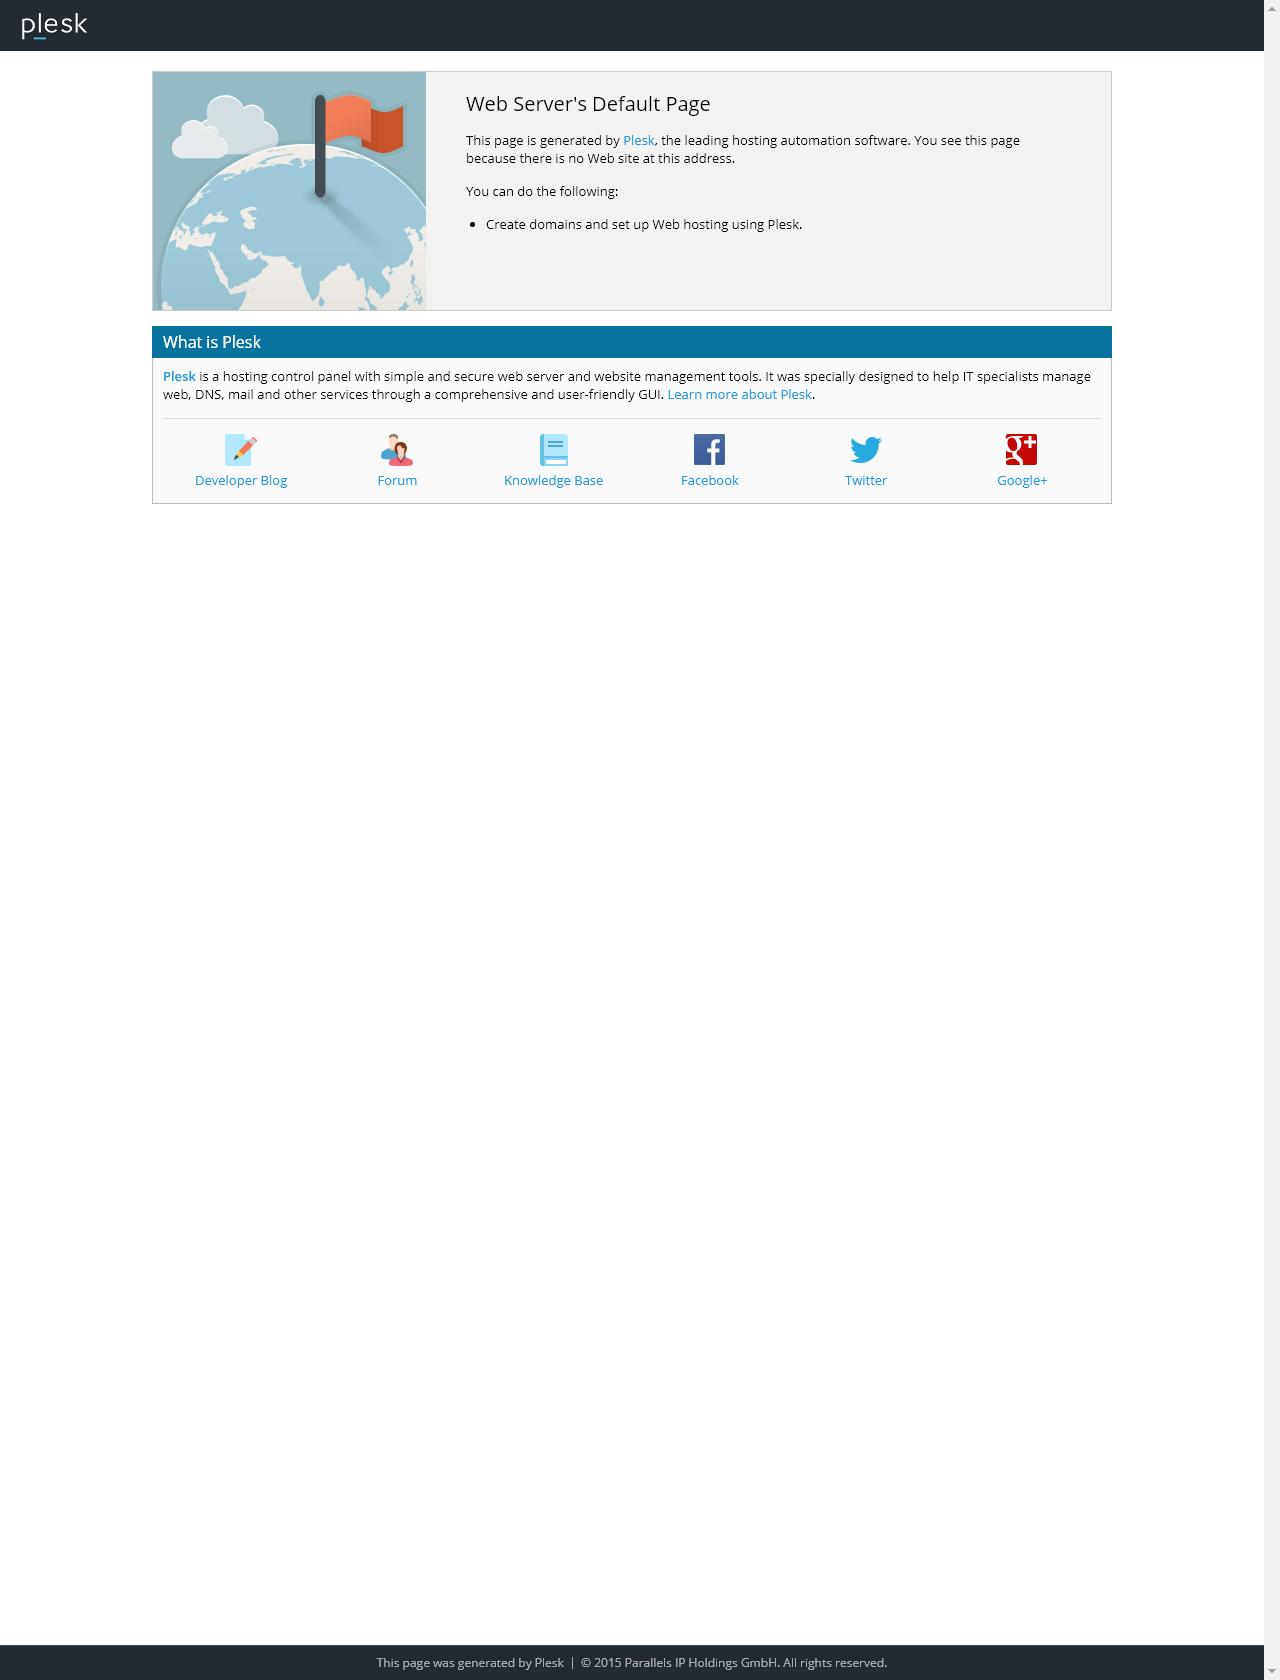 Screenshot Desktop - https://81.169.205.236/